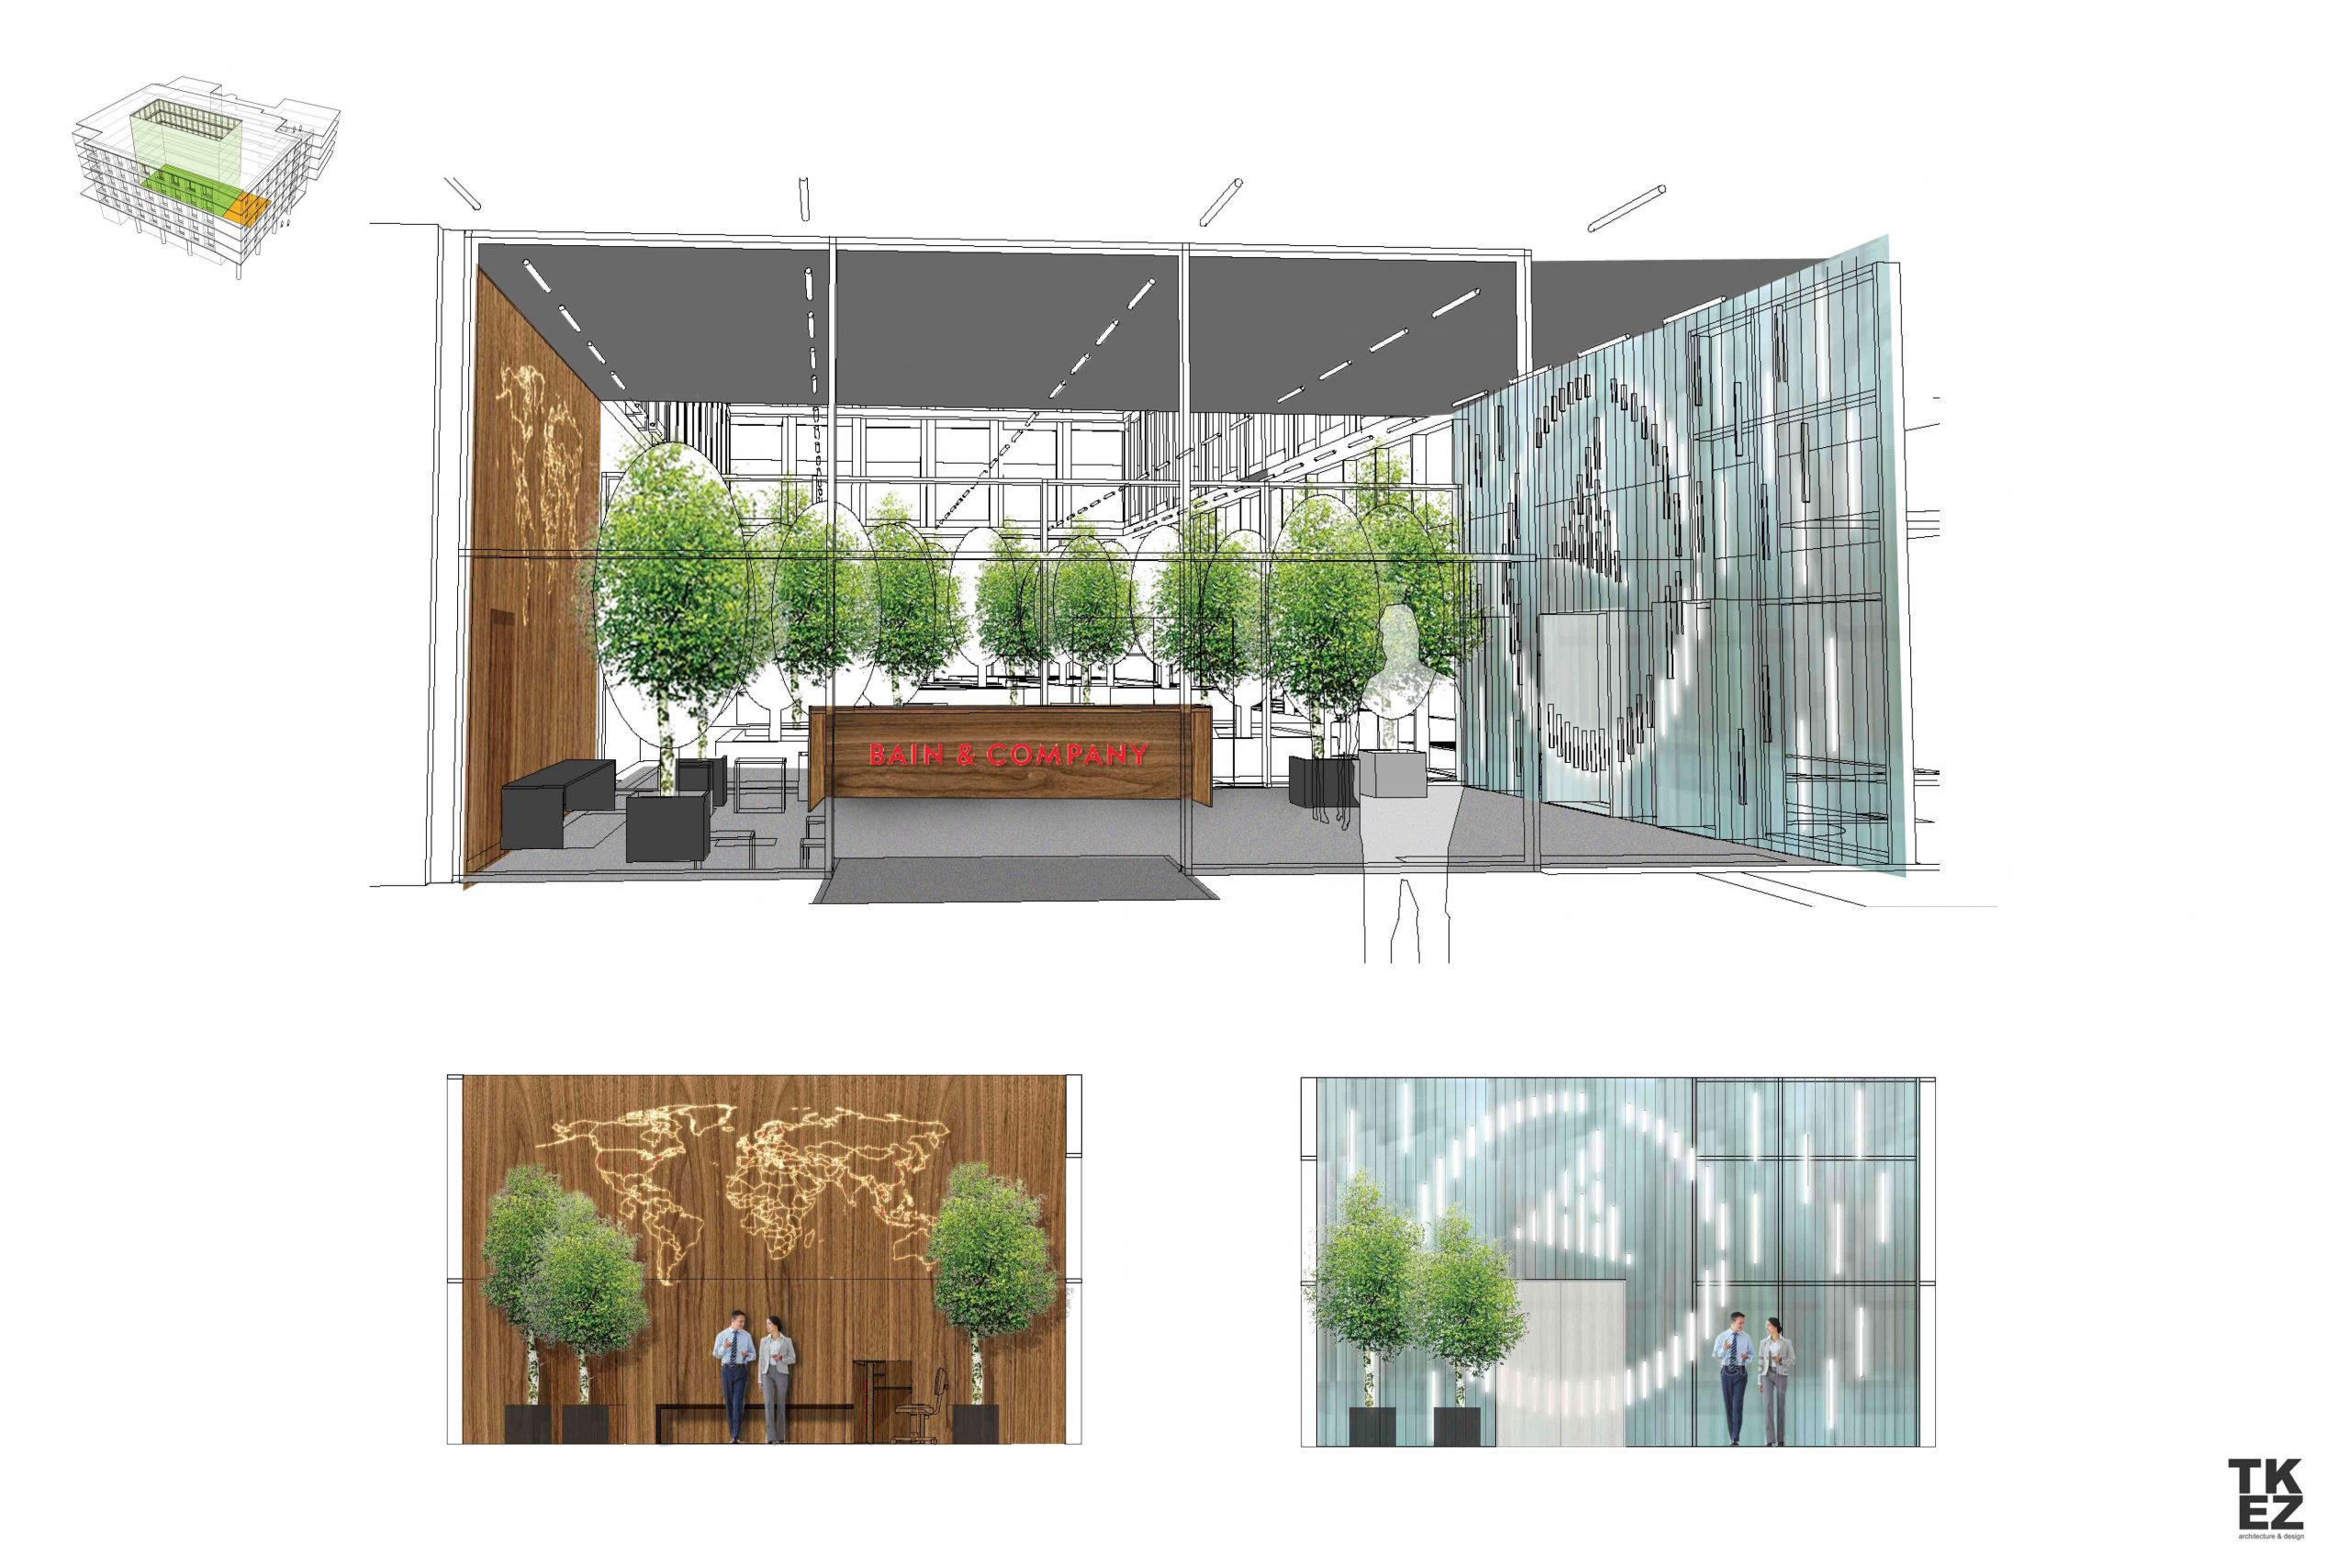 Neues Büro Bain & Company TKEZ München 7